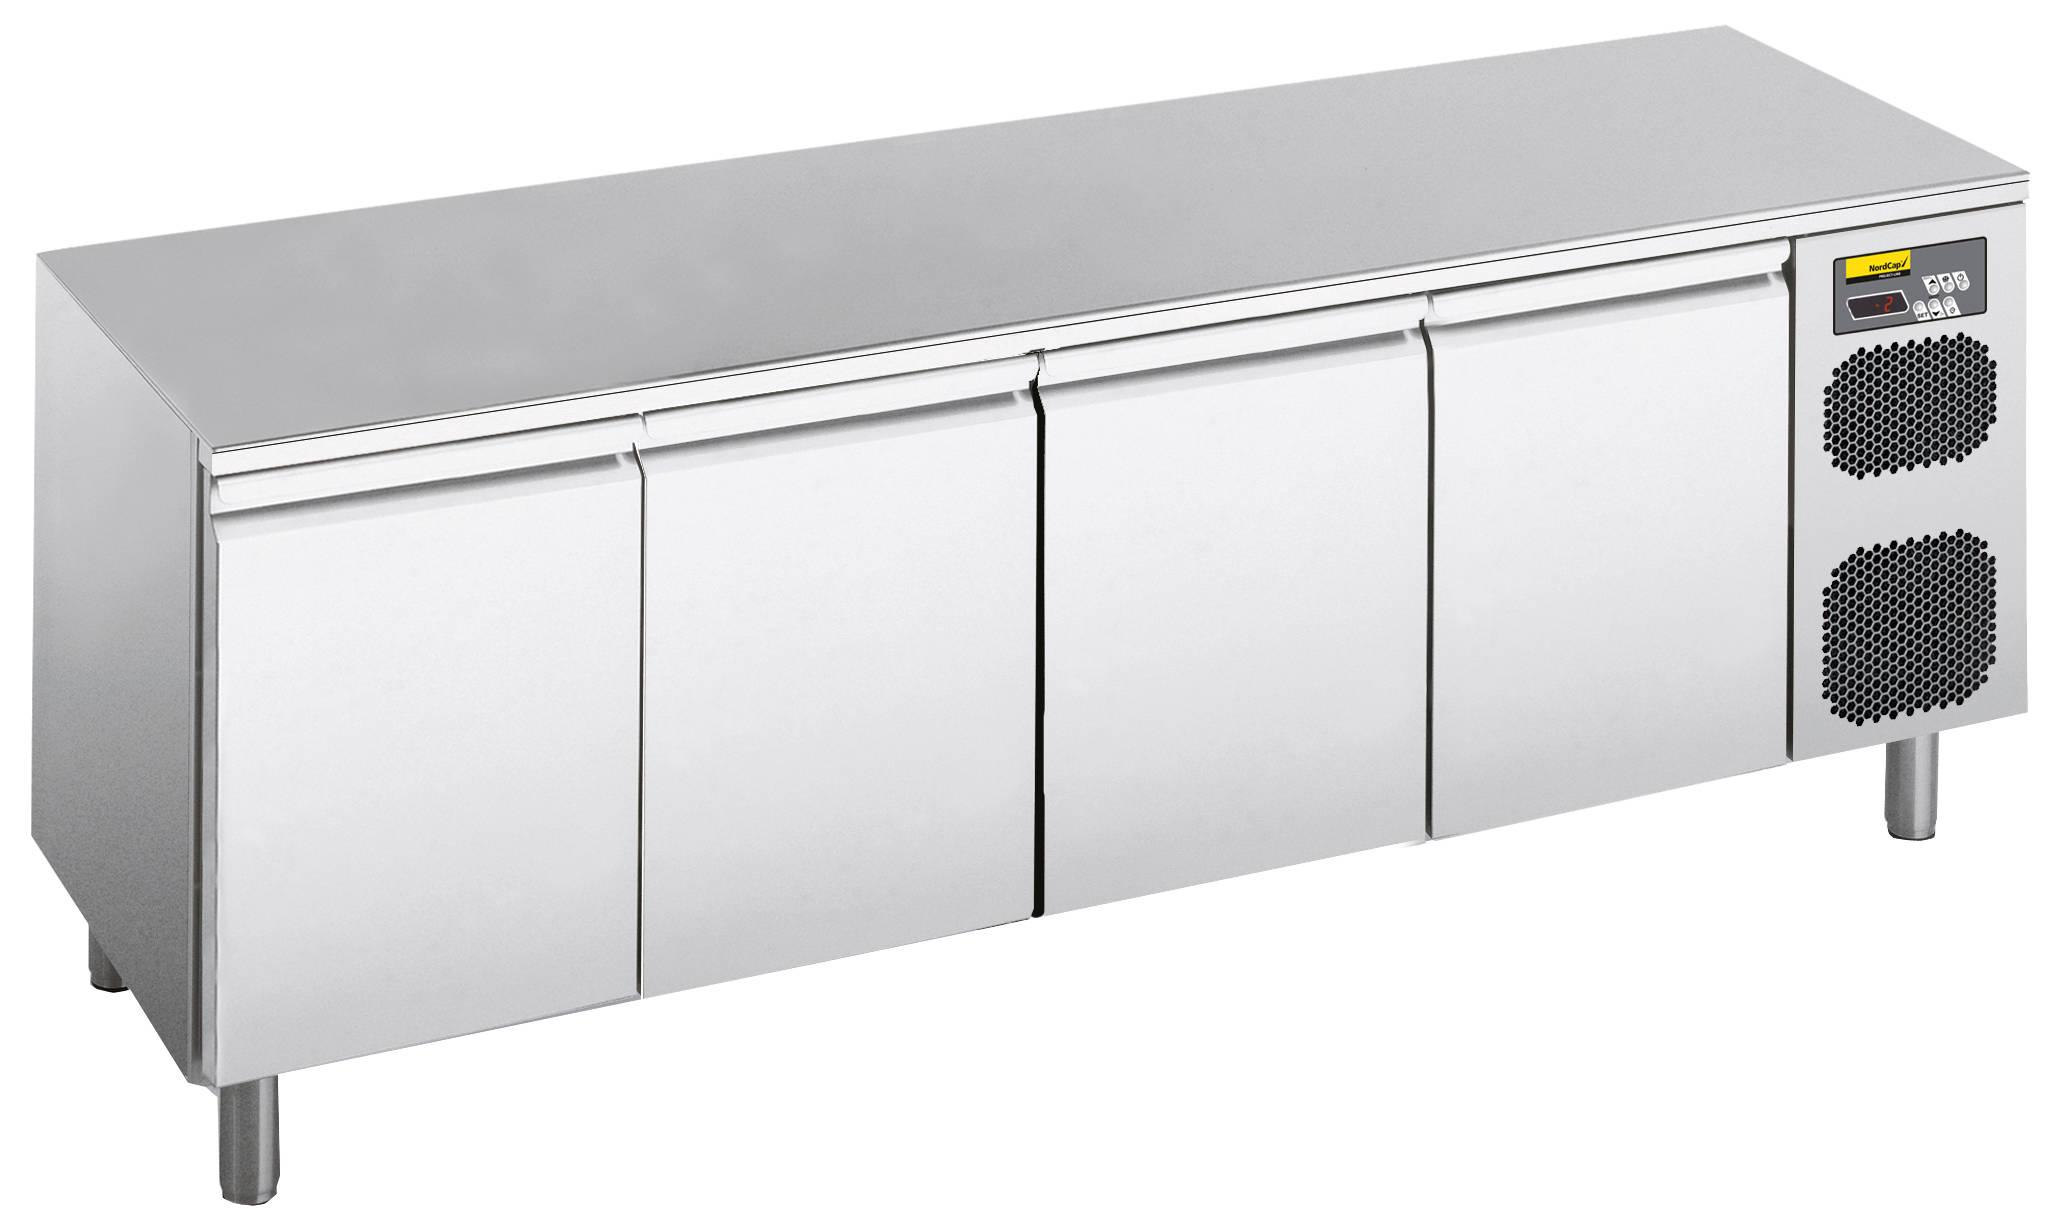 Minibar Kühlschrank Tm52 : Artikel liste